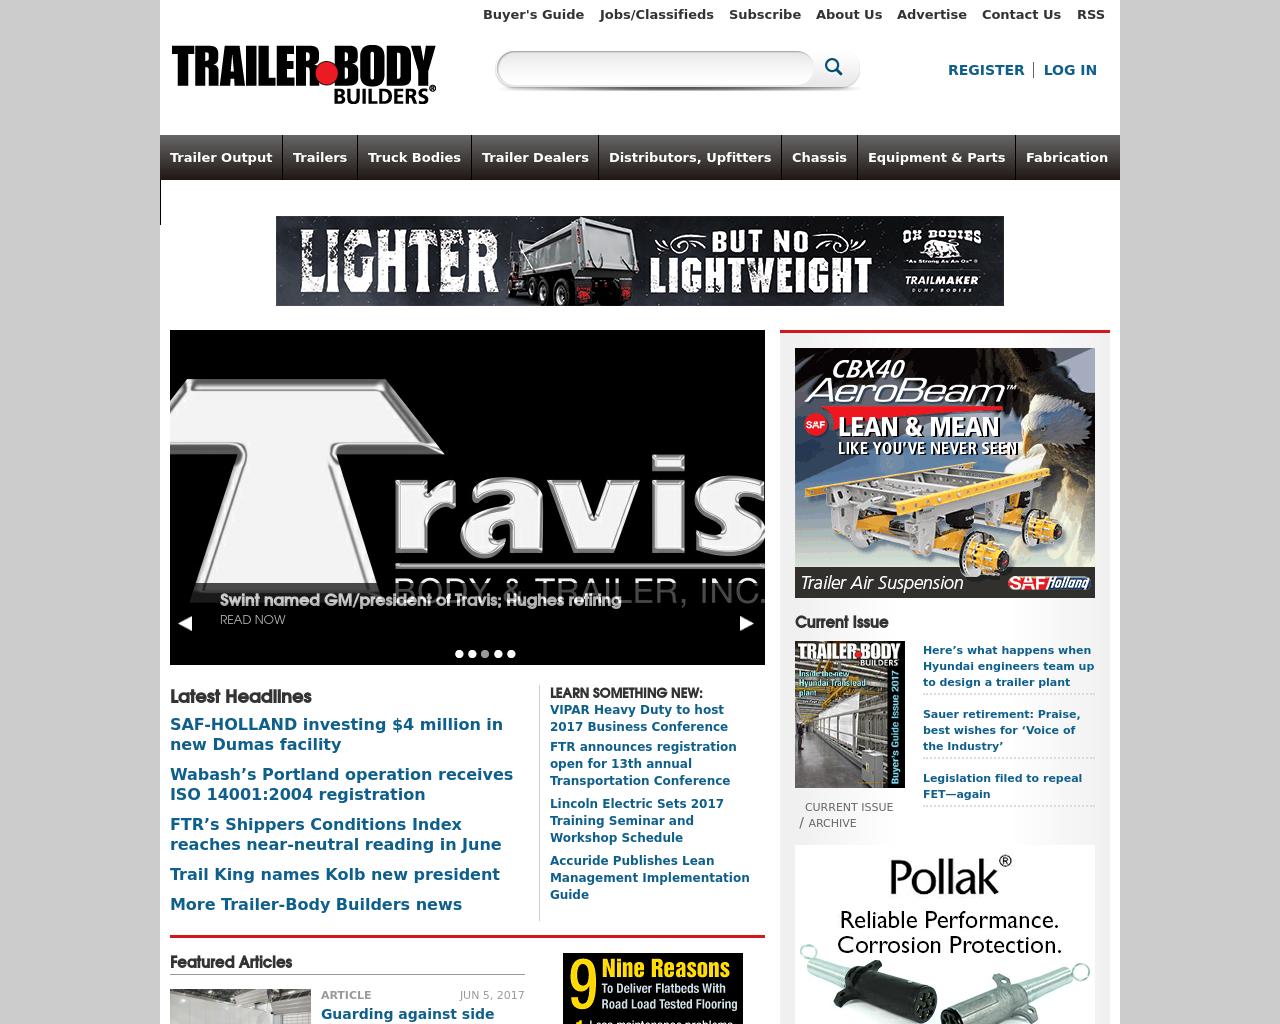 TRAILER-BODY-BUILDERS-Advertising-Reviews-Pricing